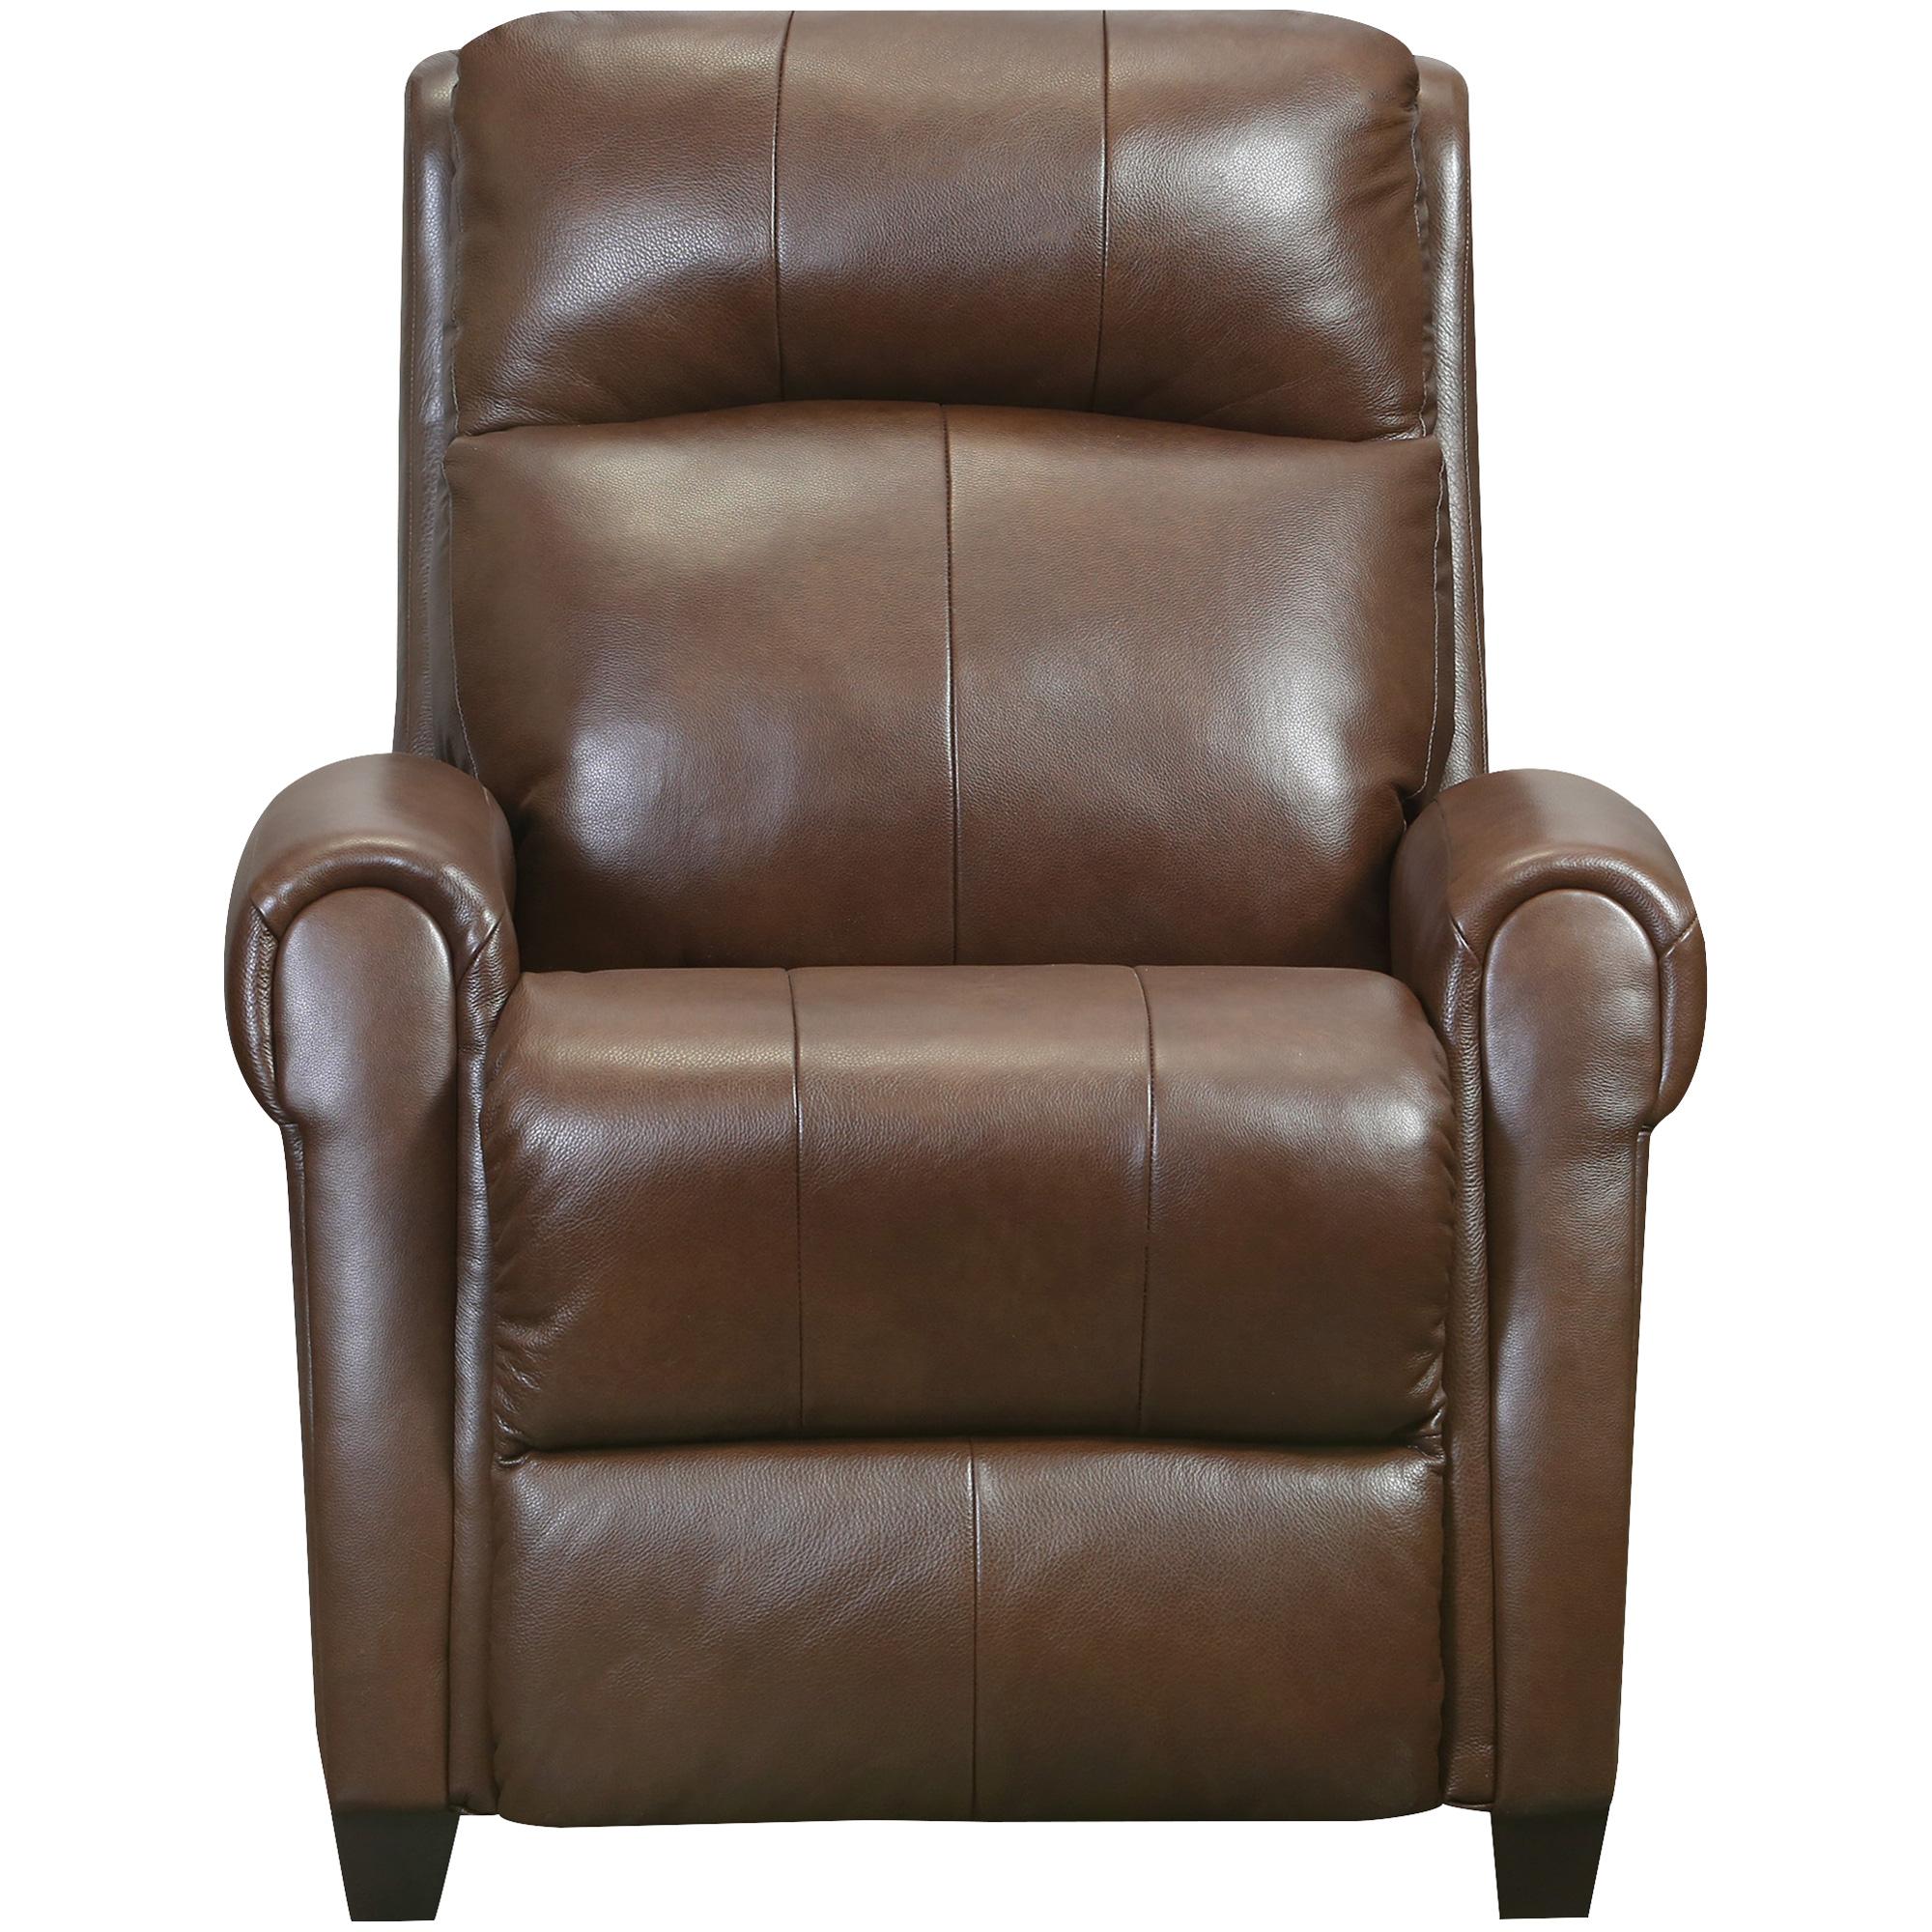 Southern Motion | Saturn Hazelnut Zero Gravity Power+ Leather Leg Recliner Chair